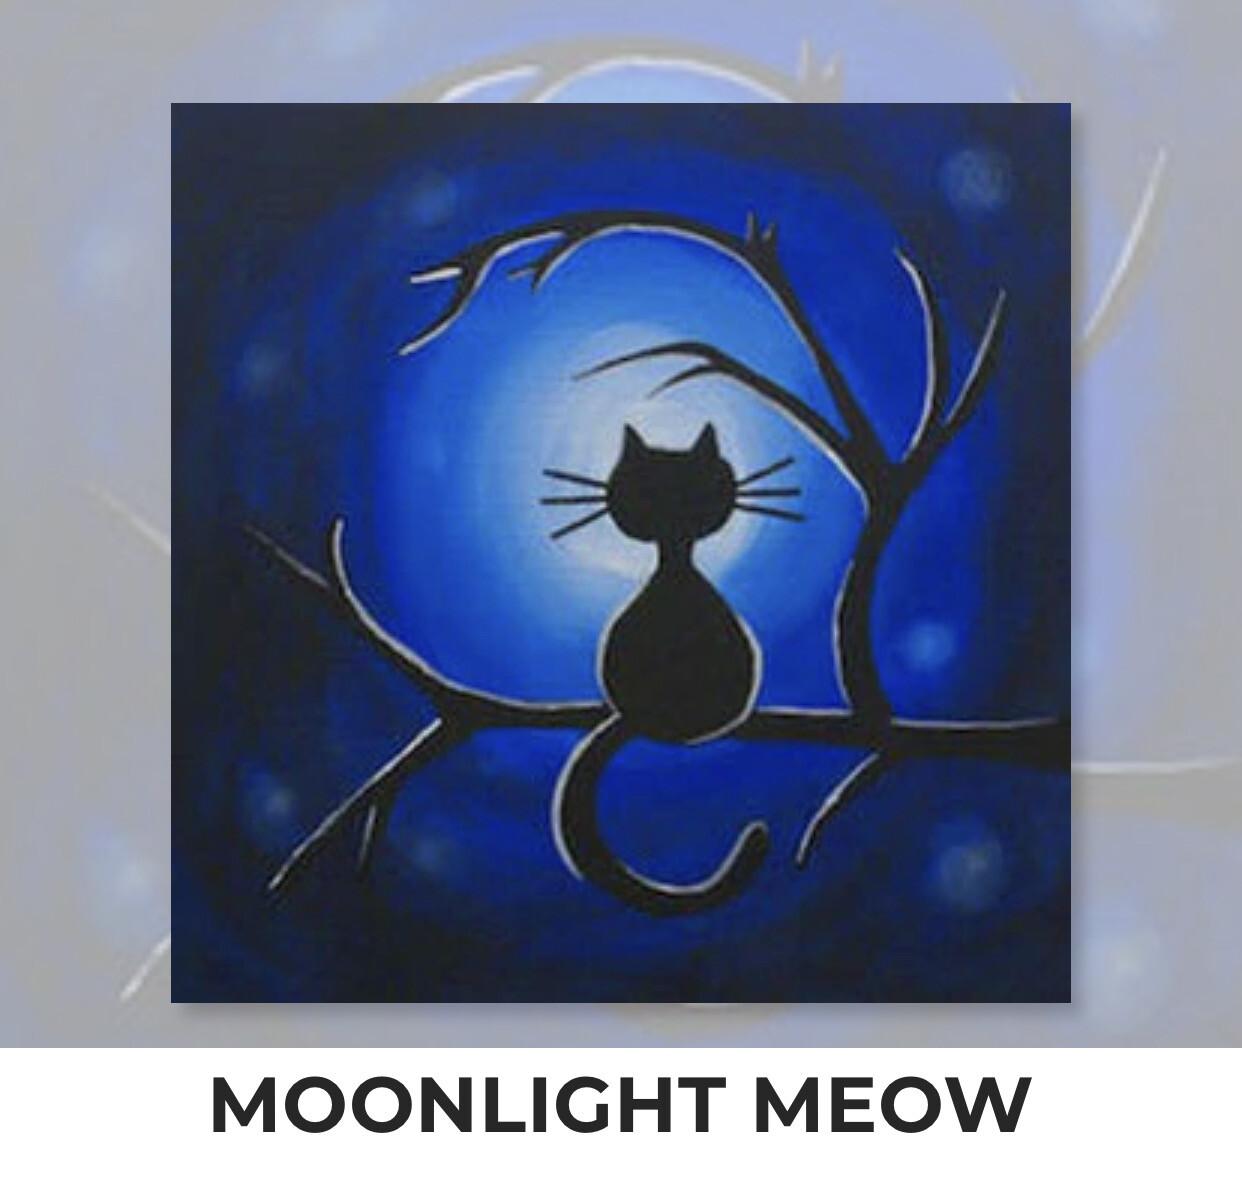 Moonlight Meow KIDS Acrylic Paint On Canvas DIY Art Kit - 3 Week Special Order